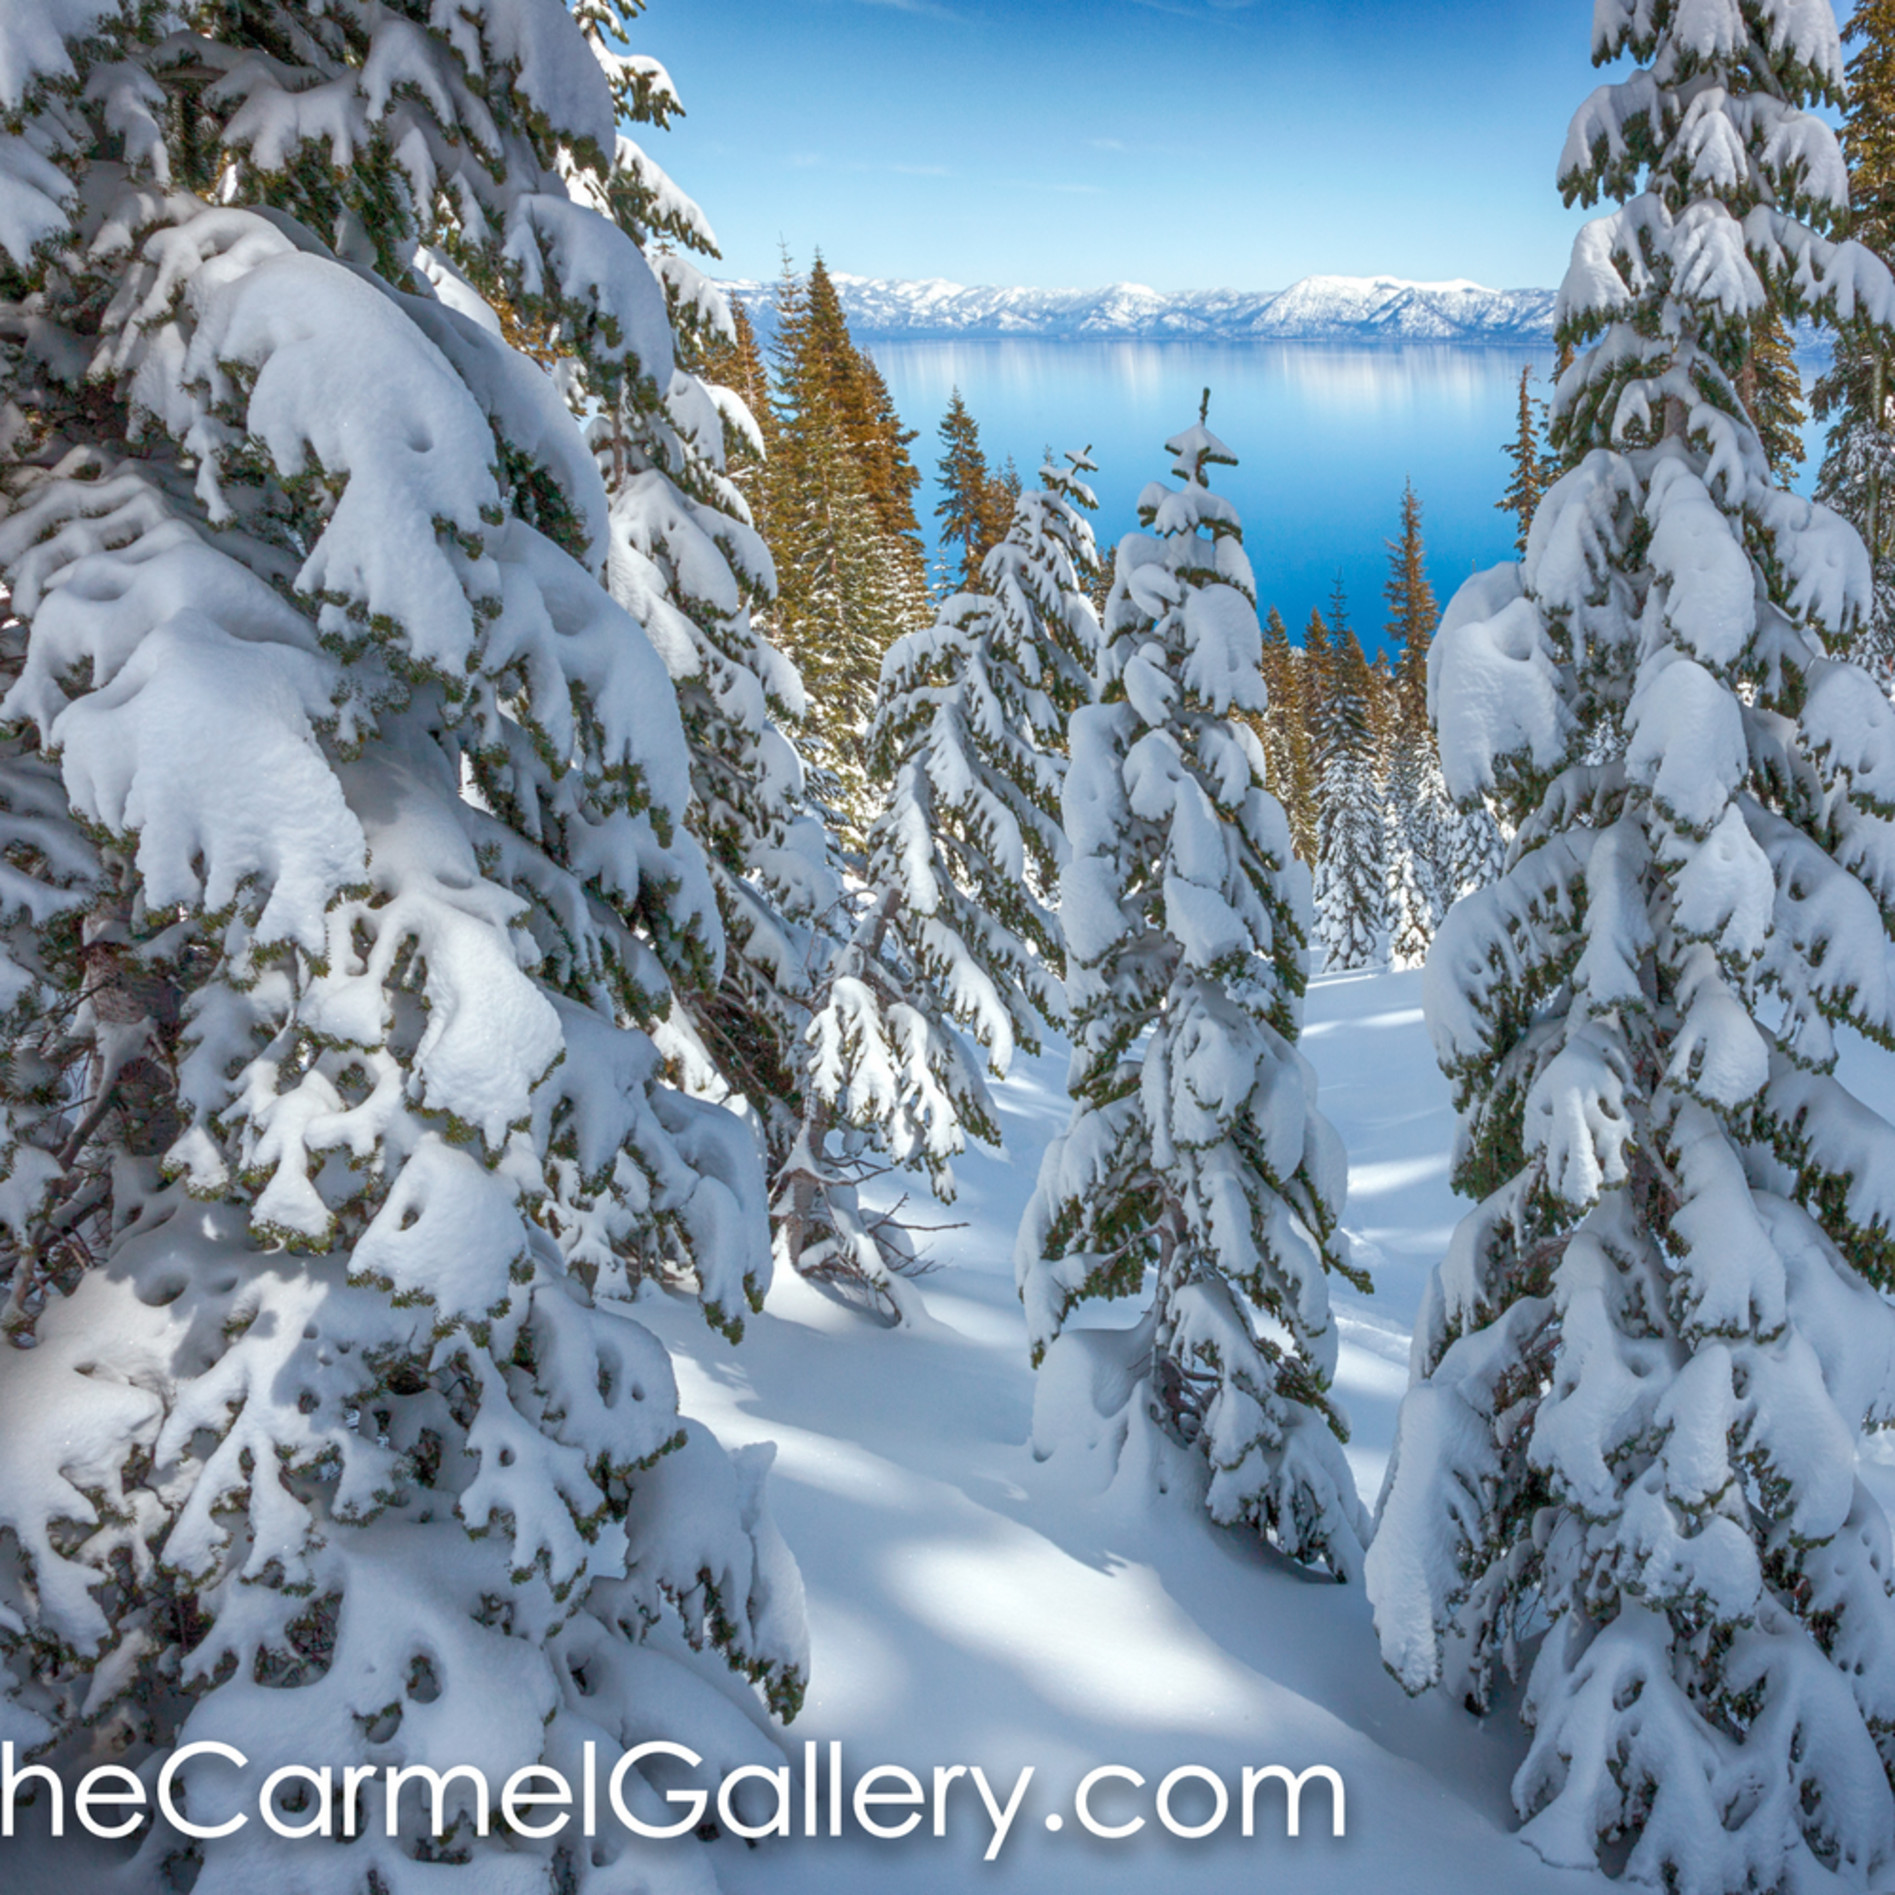 Snowy calm tahoe fvtyew